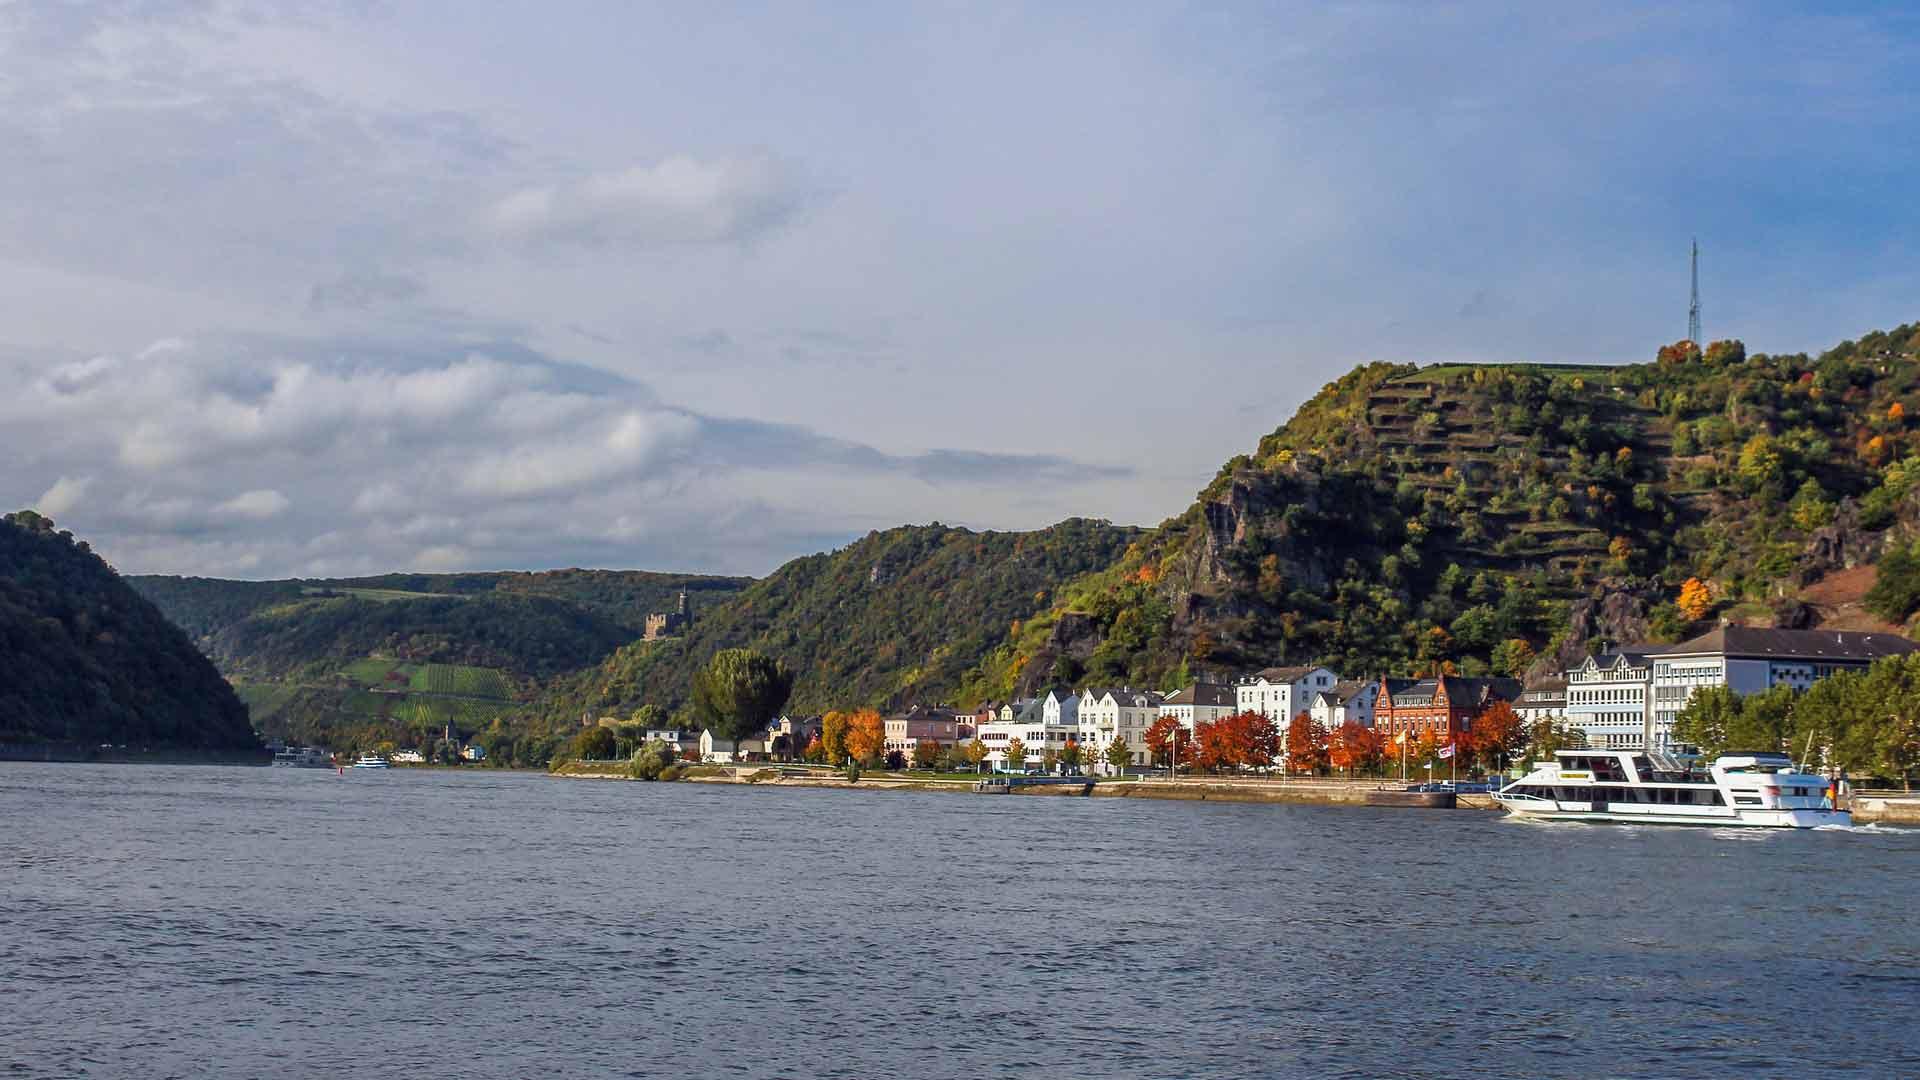 St. Goar aan de Rijn